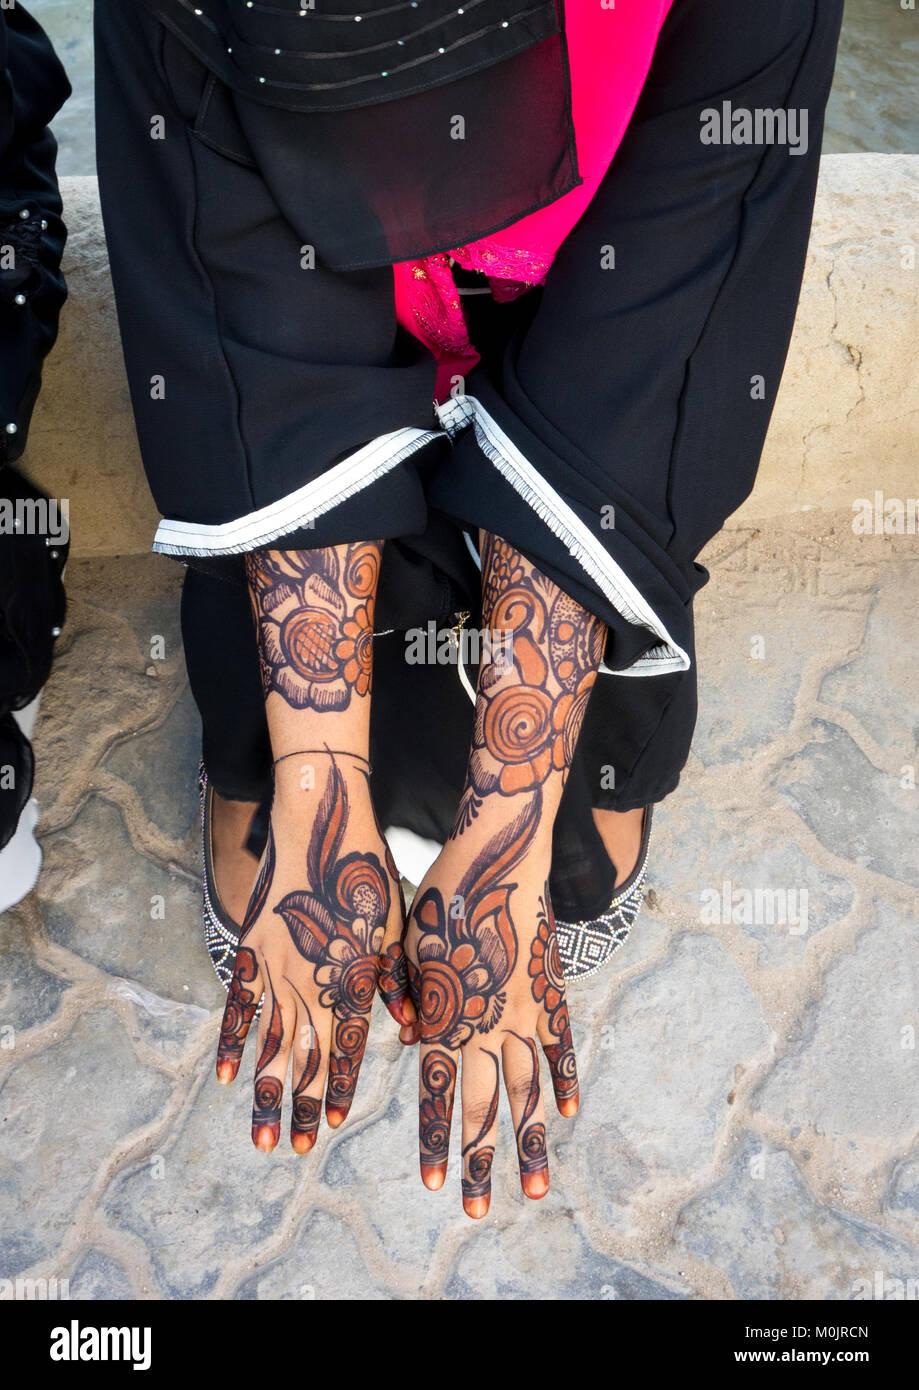 Woman wearing a burqa showing her henna painted hands, Lamu Island, Kenya Stock Photo